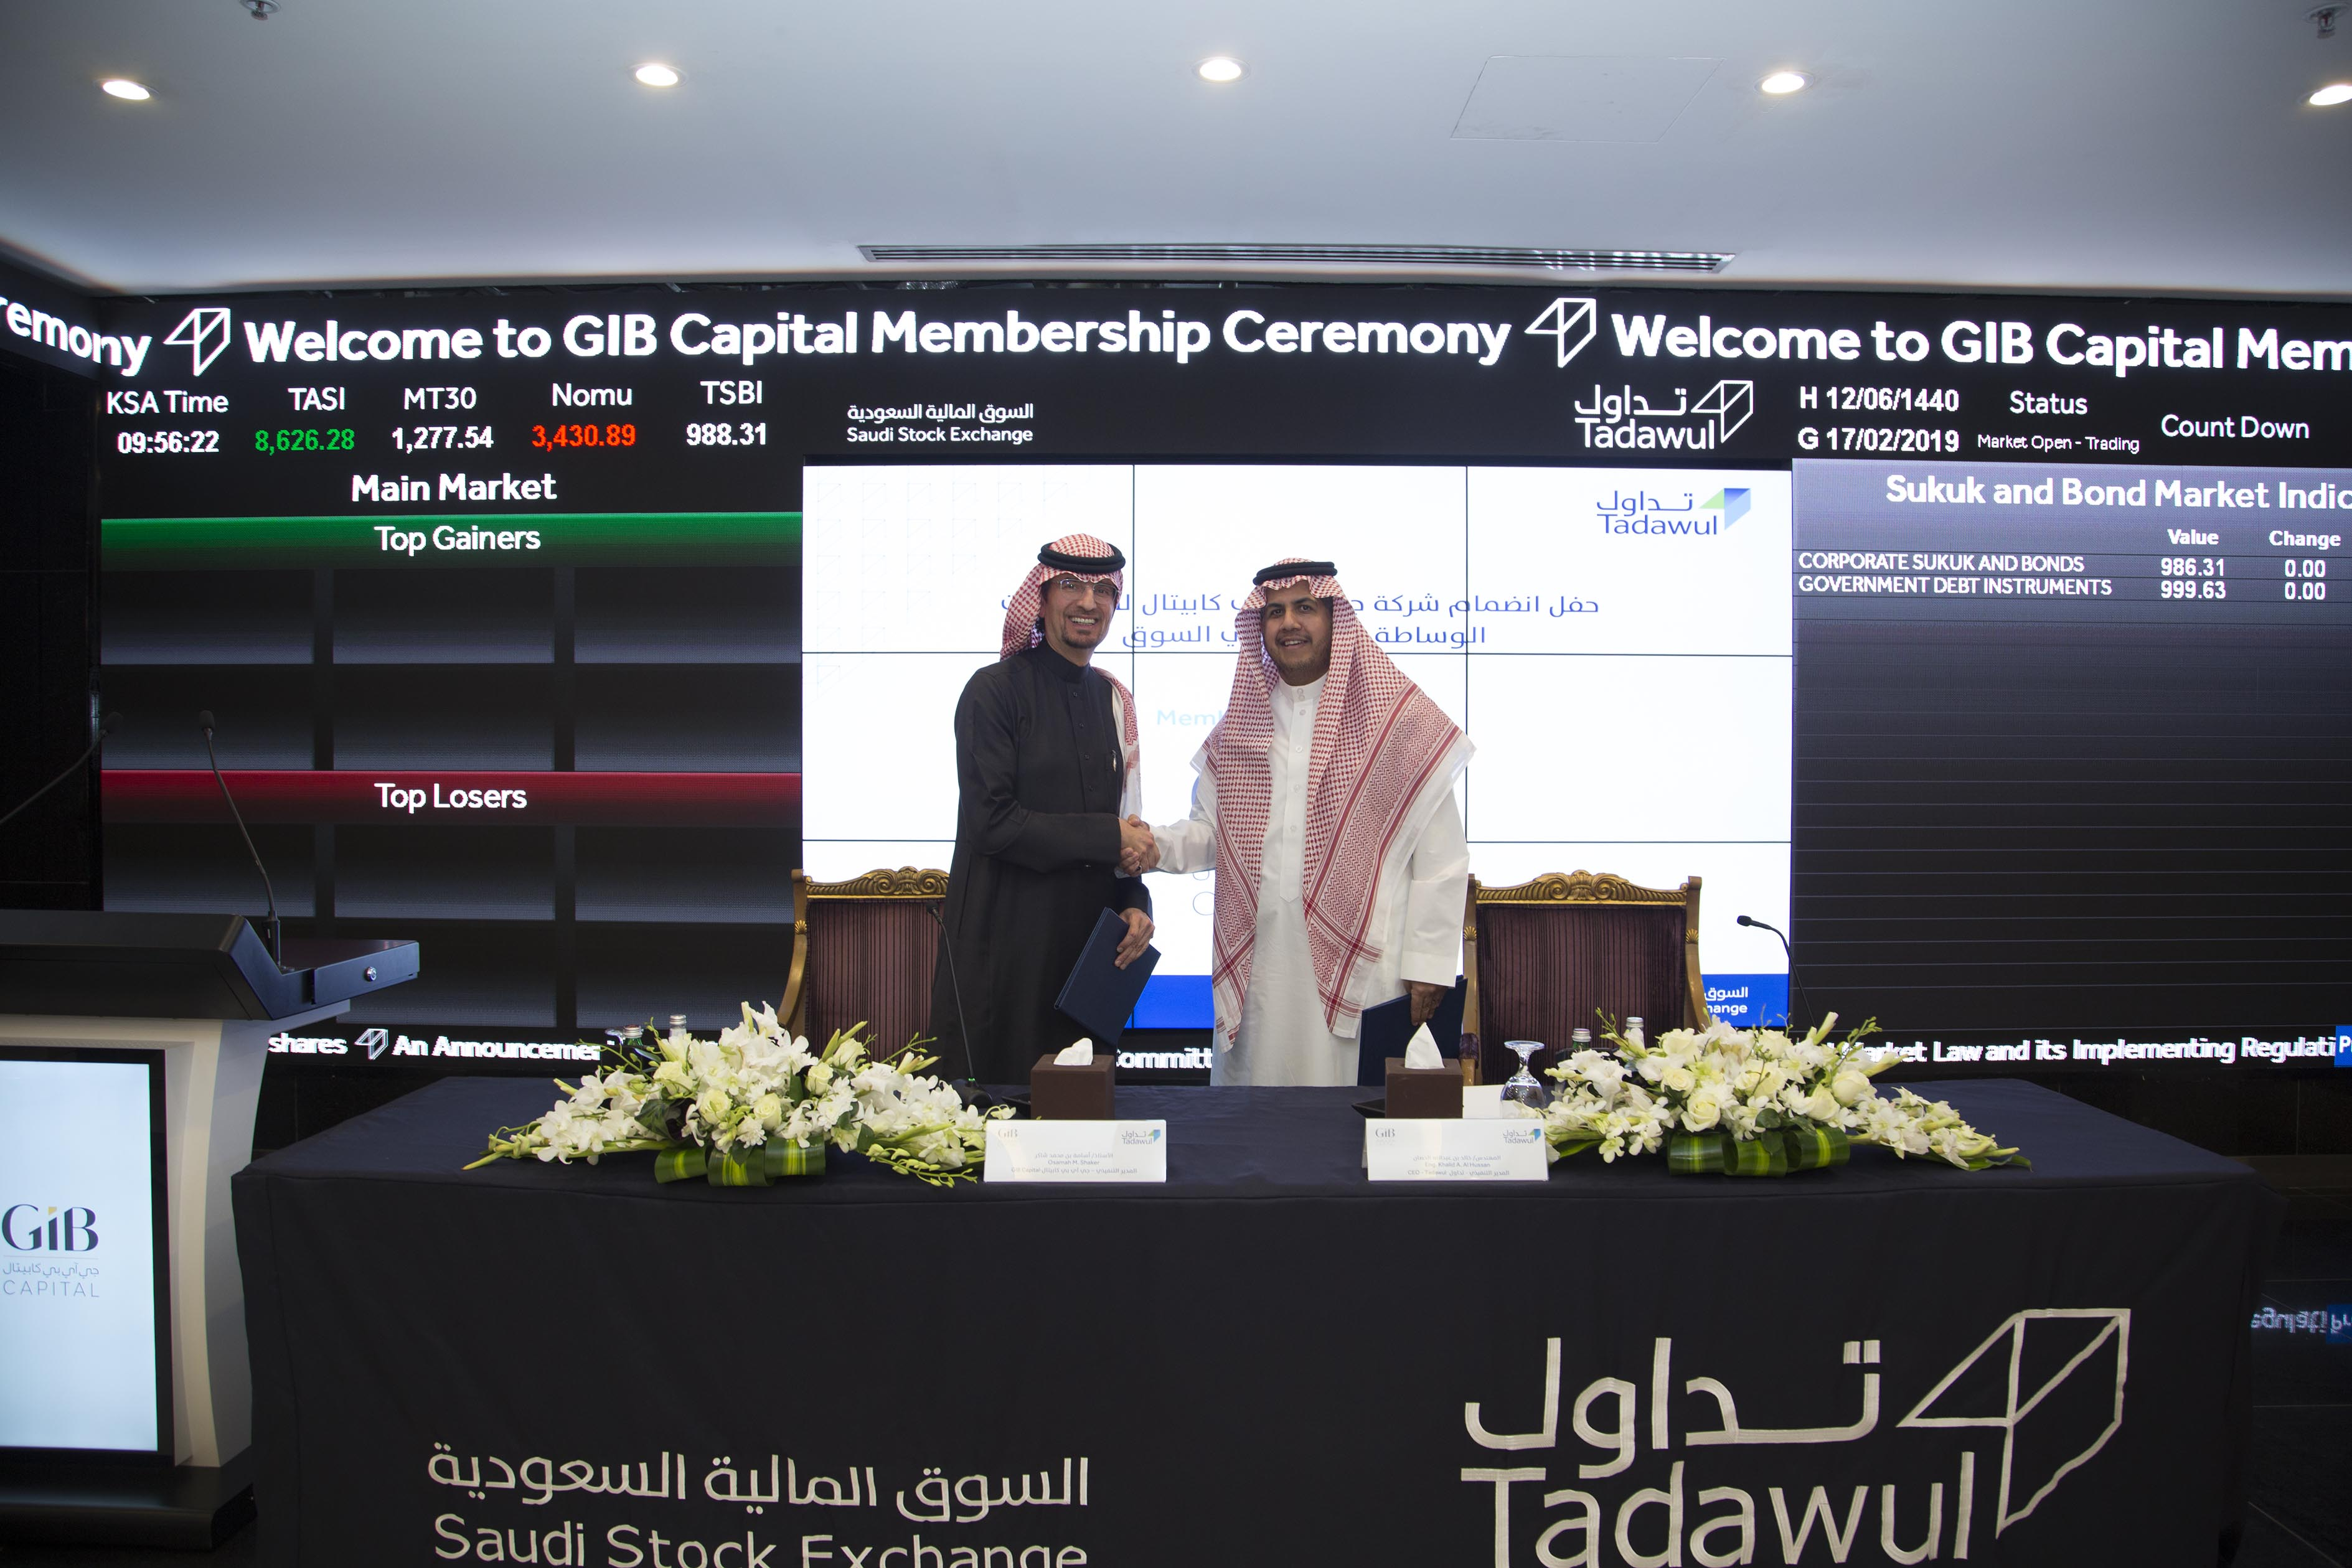 (Left) Osamah Shaker CEO and Board member of GIB Capital - (Right) Khalid Al Hussan CEO of Tadawul